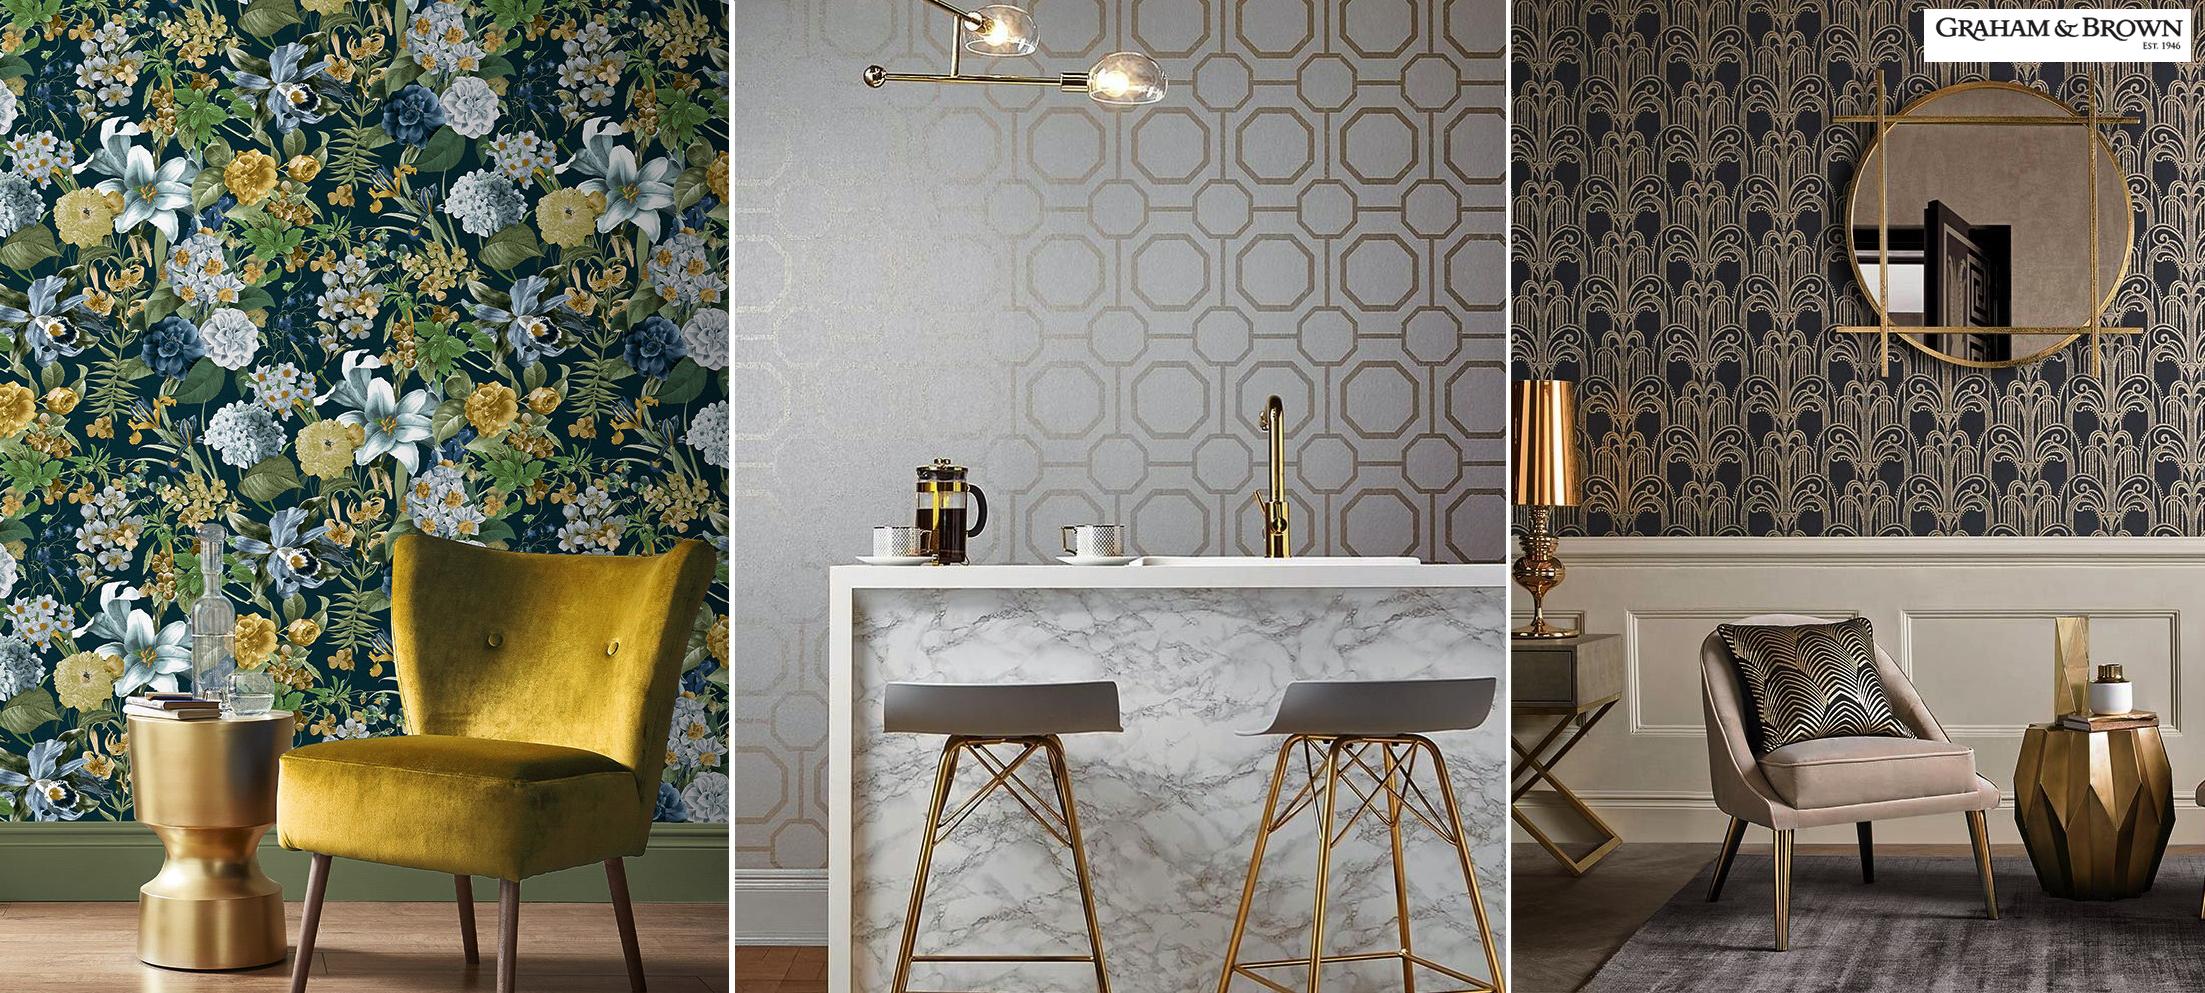 graham-and-brown-wallpaper-australia1.jpg